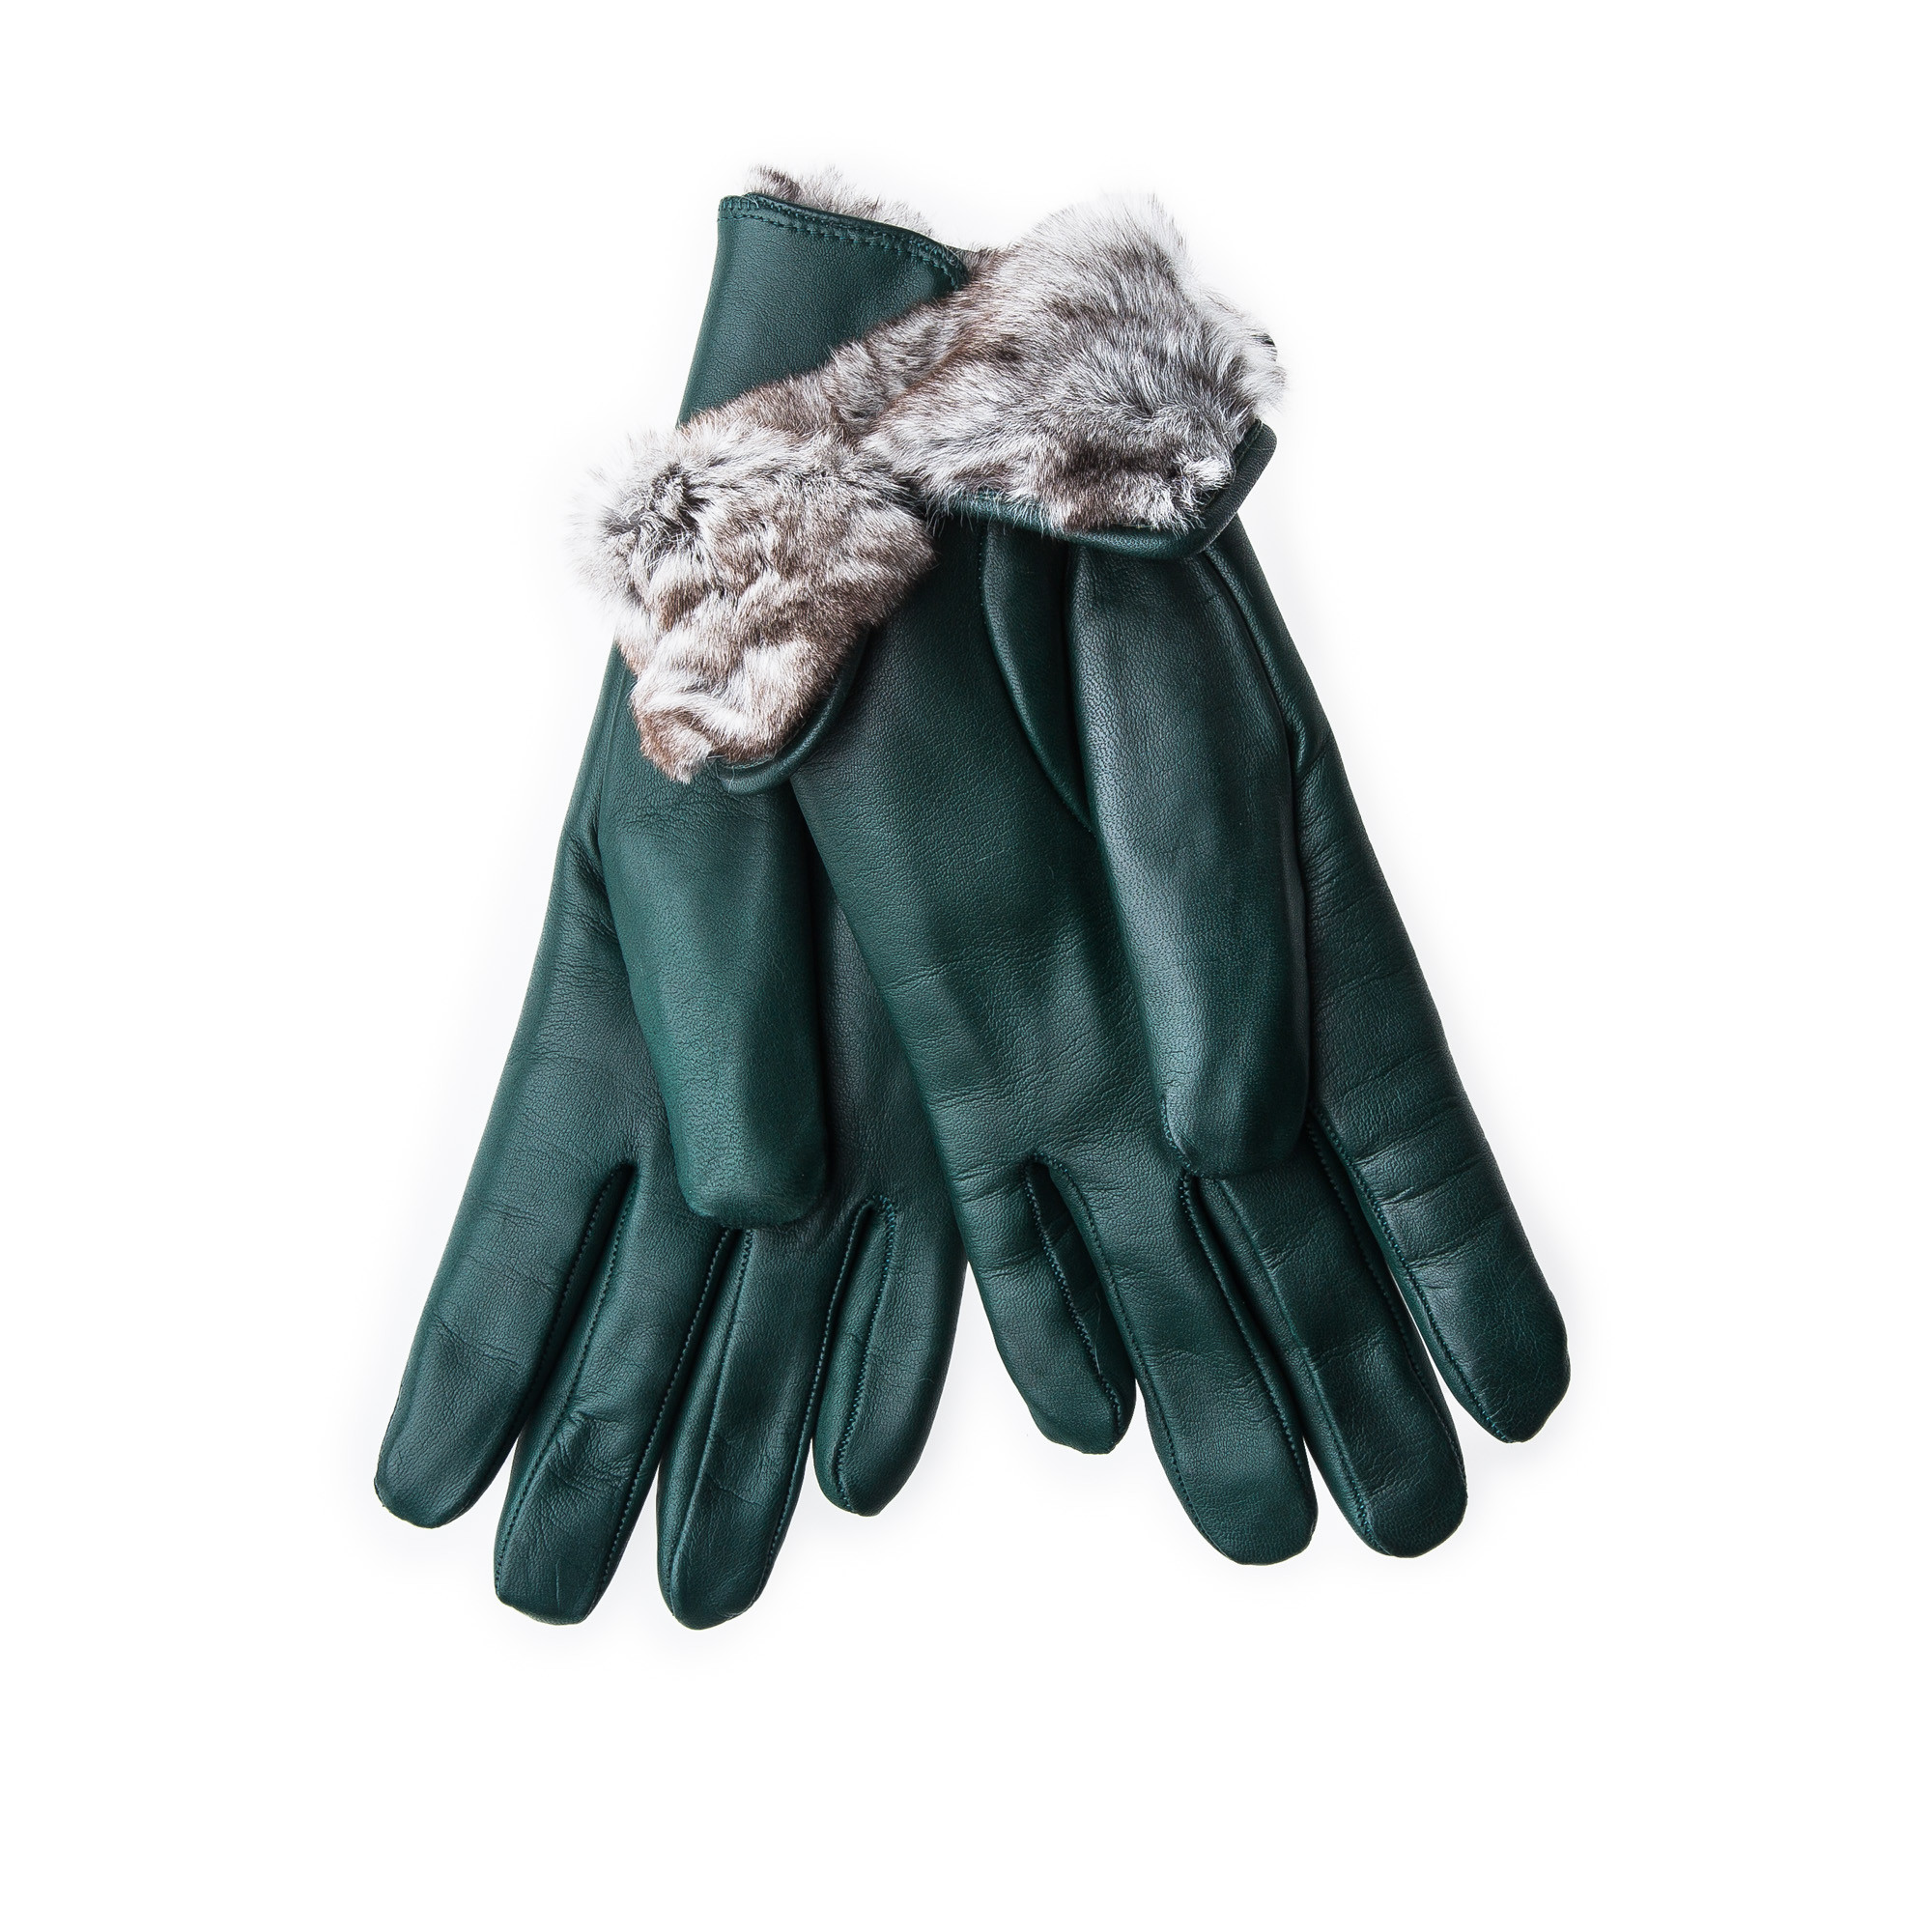 Ladies leather gloves large - Merola Ladies Leather Gloves With Rex Rabbit Fur Dark Green